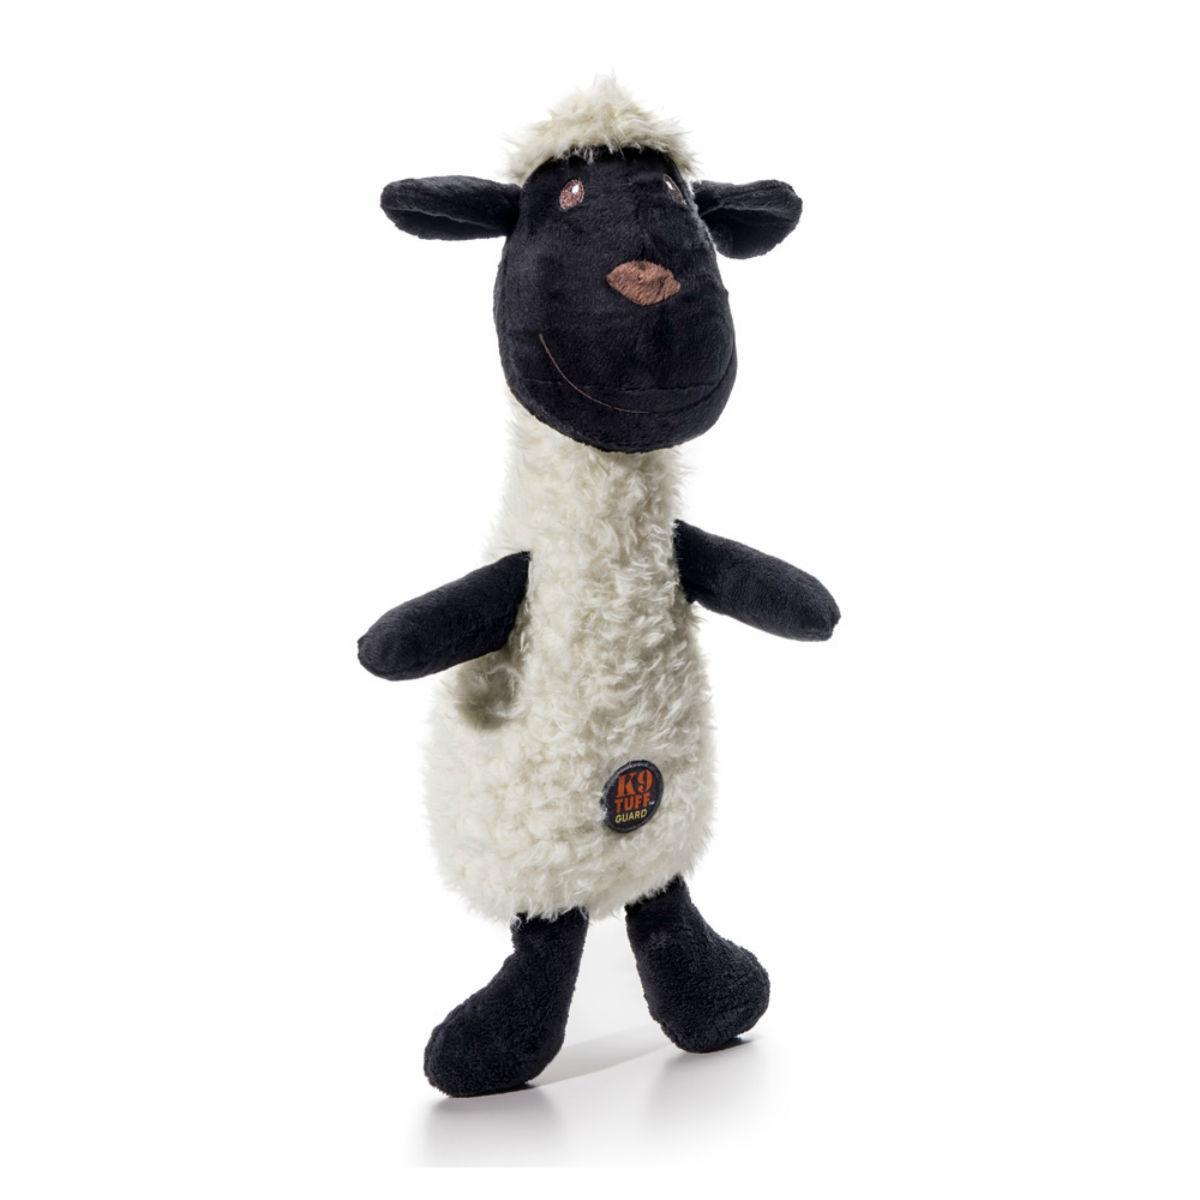 Charming Scruffles Dog Toy - Lamb